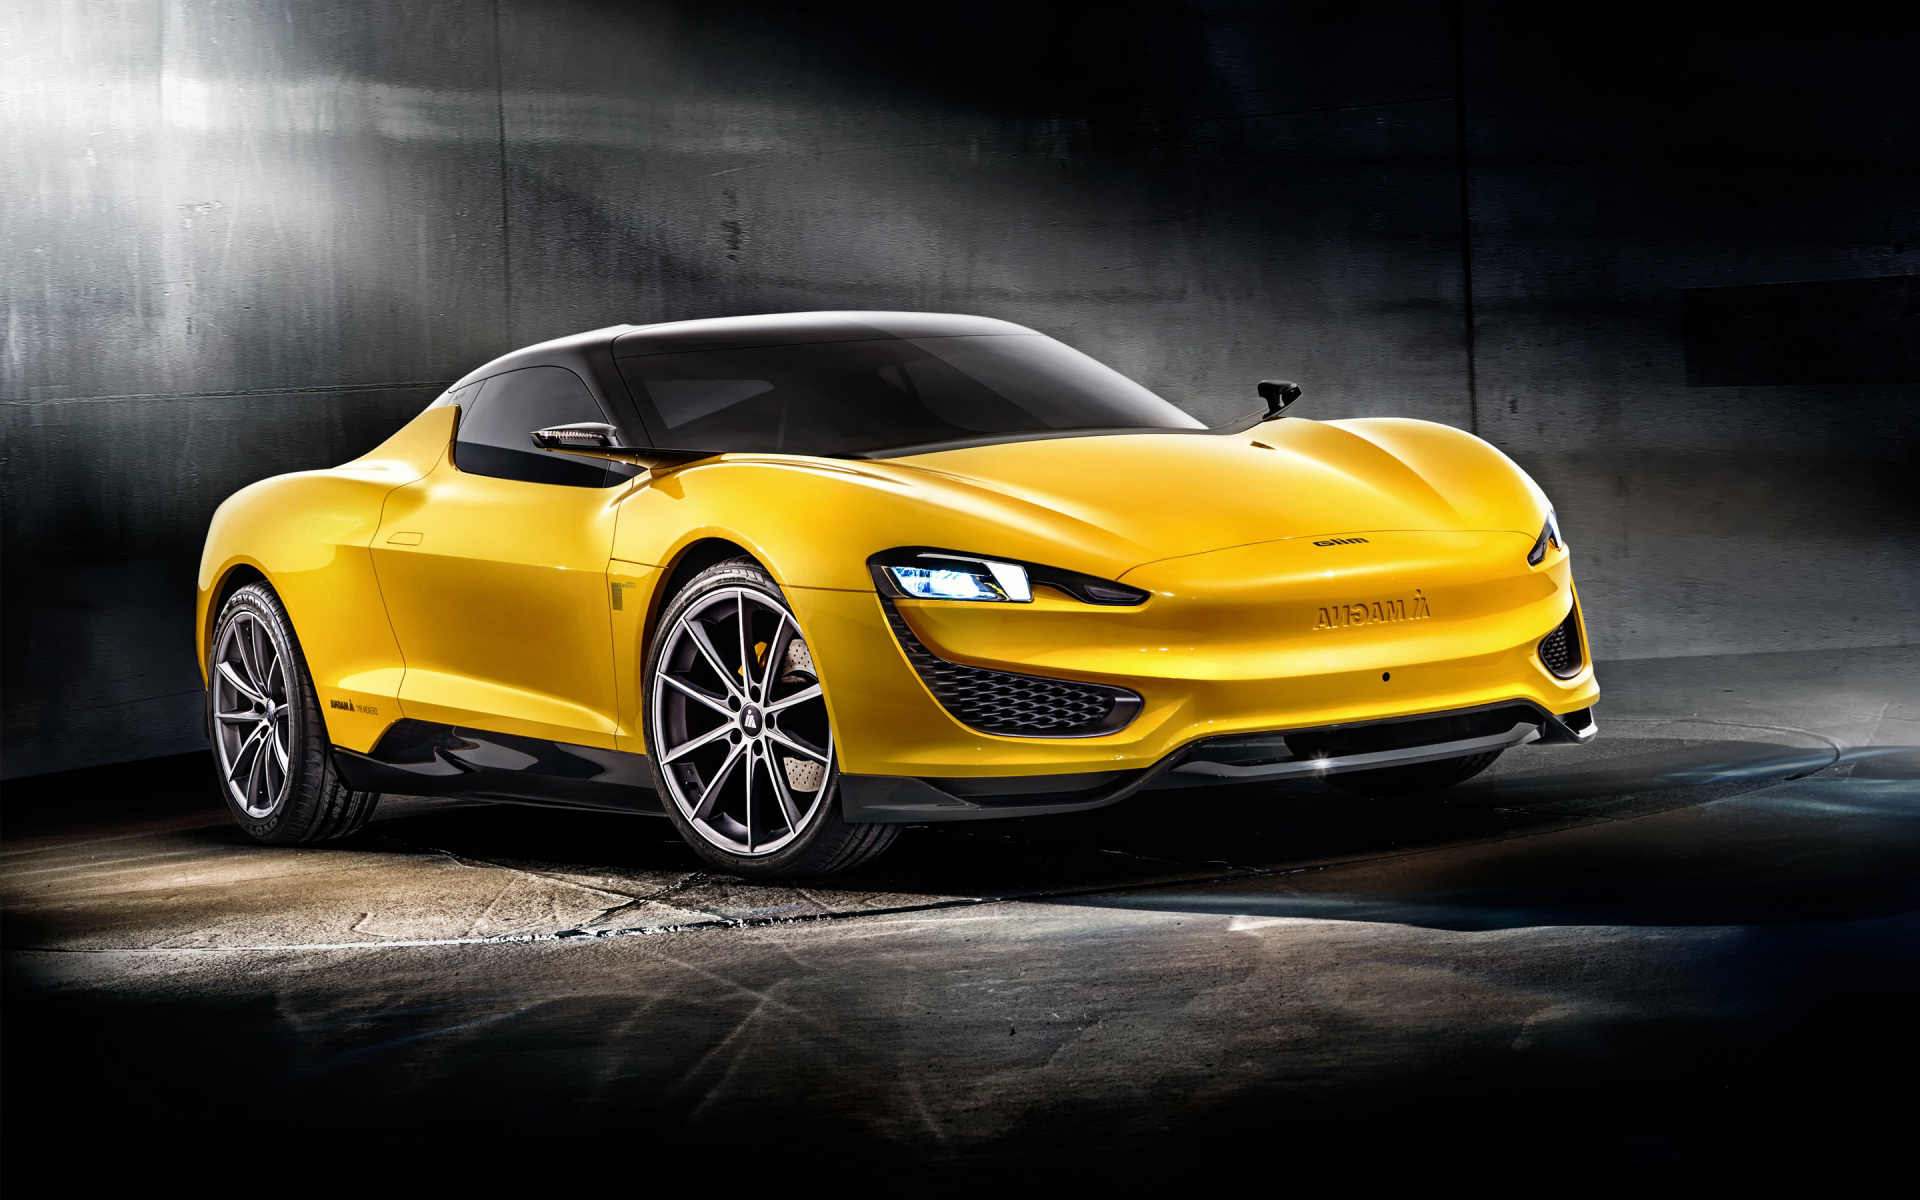 2015 Supercar Wallpaper HD Desktop All About Gallery Car 1920x1200